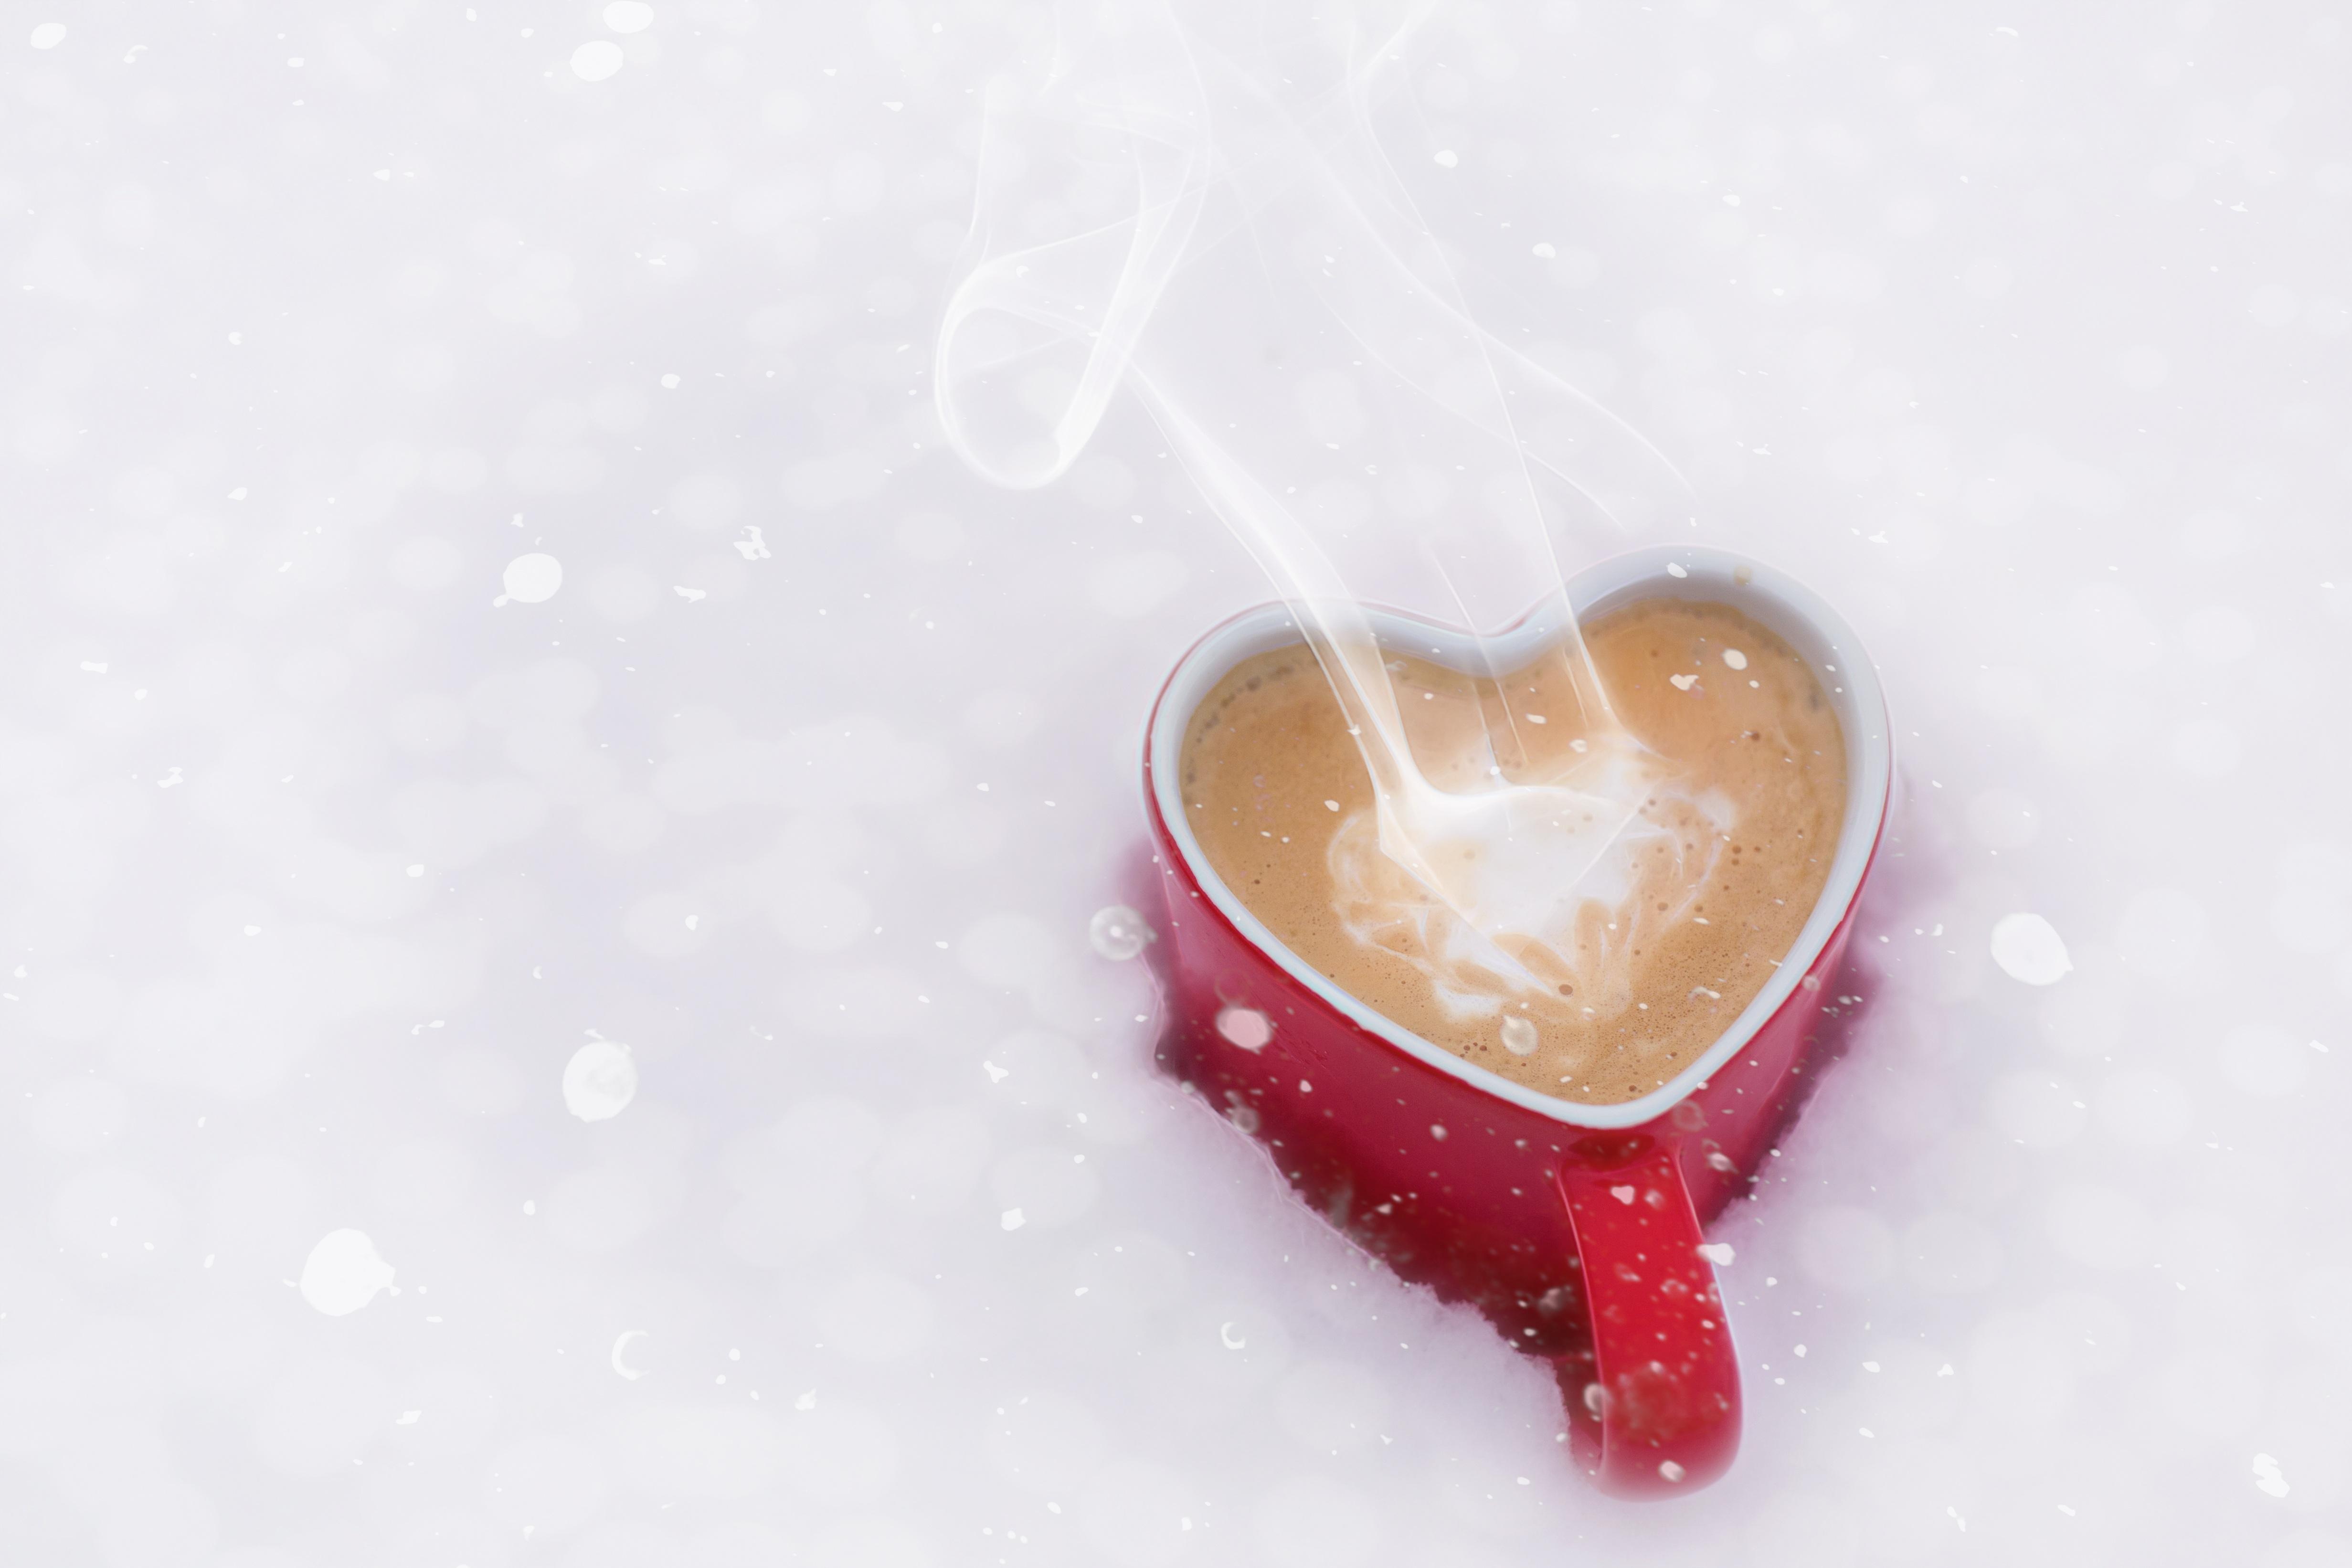 Hand Snow Winter Coffee Petal Love Weather Romantic Close Up Organ Valentine  Melting Freezing Macro Photography